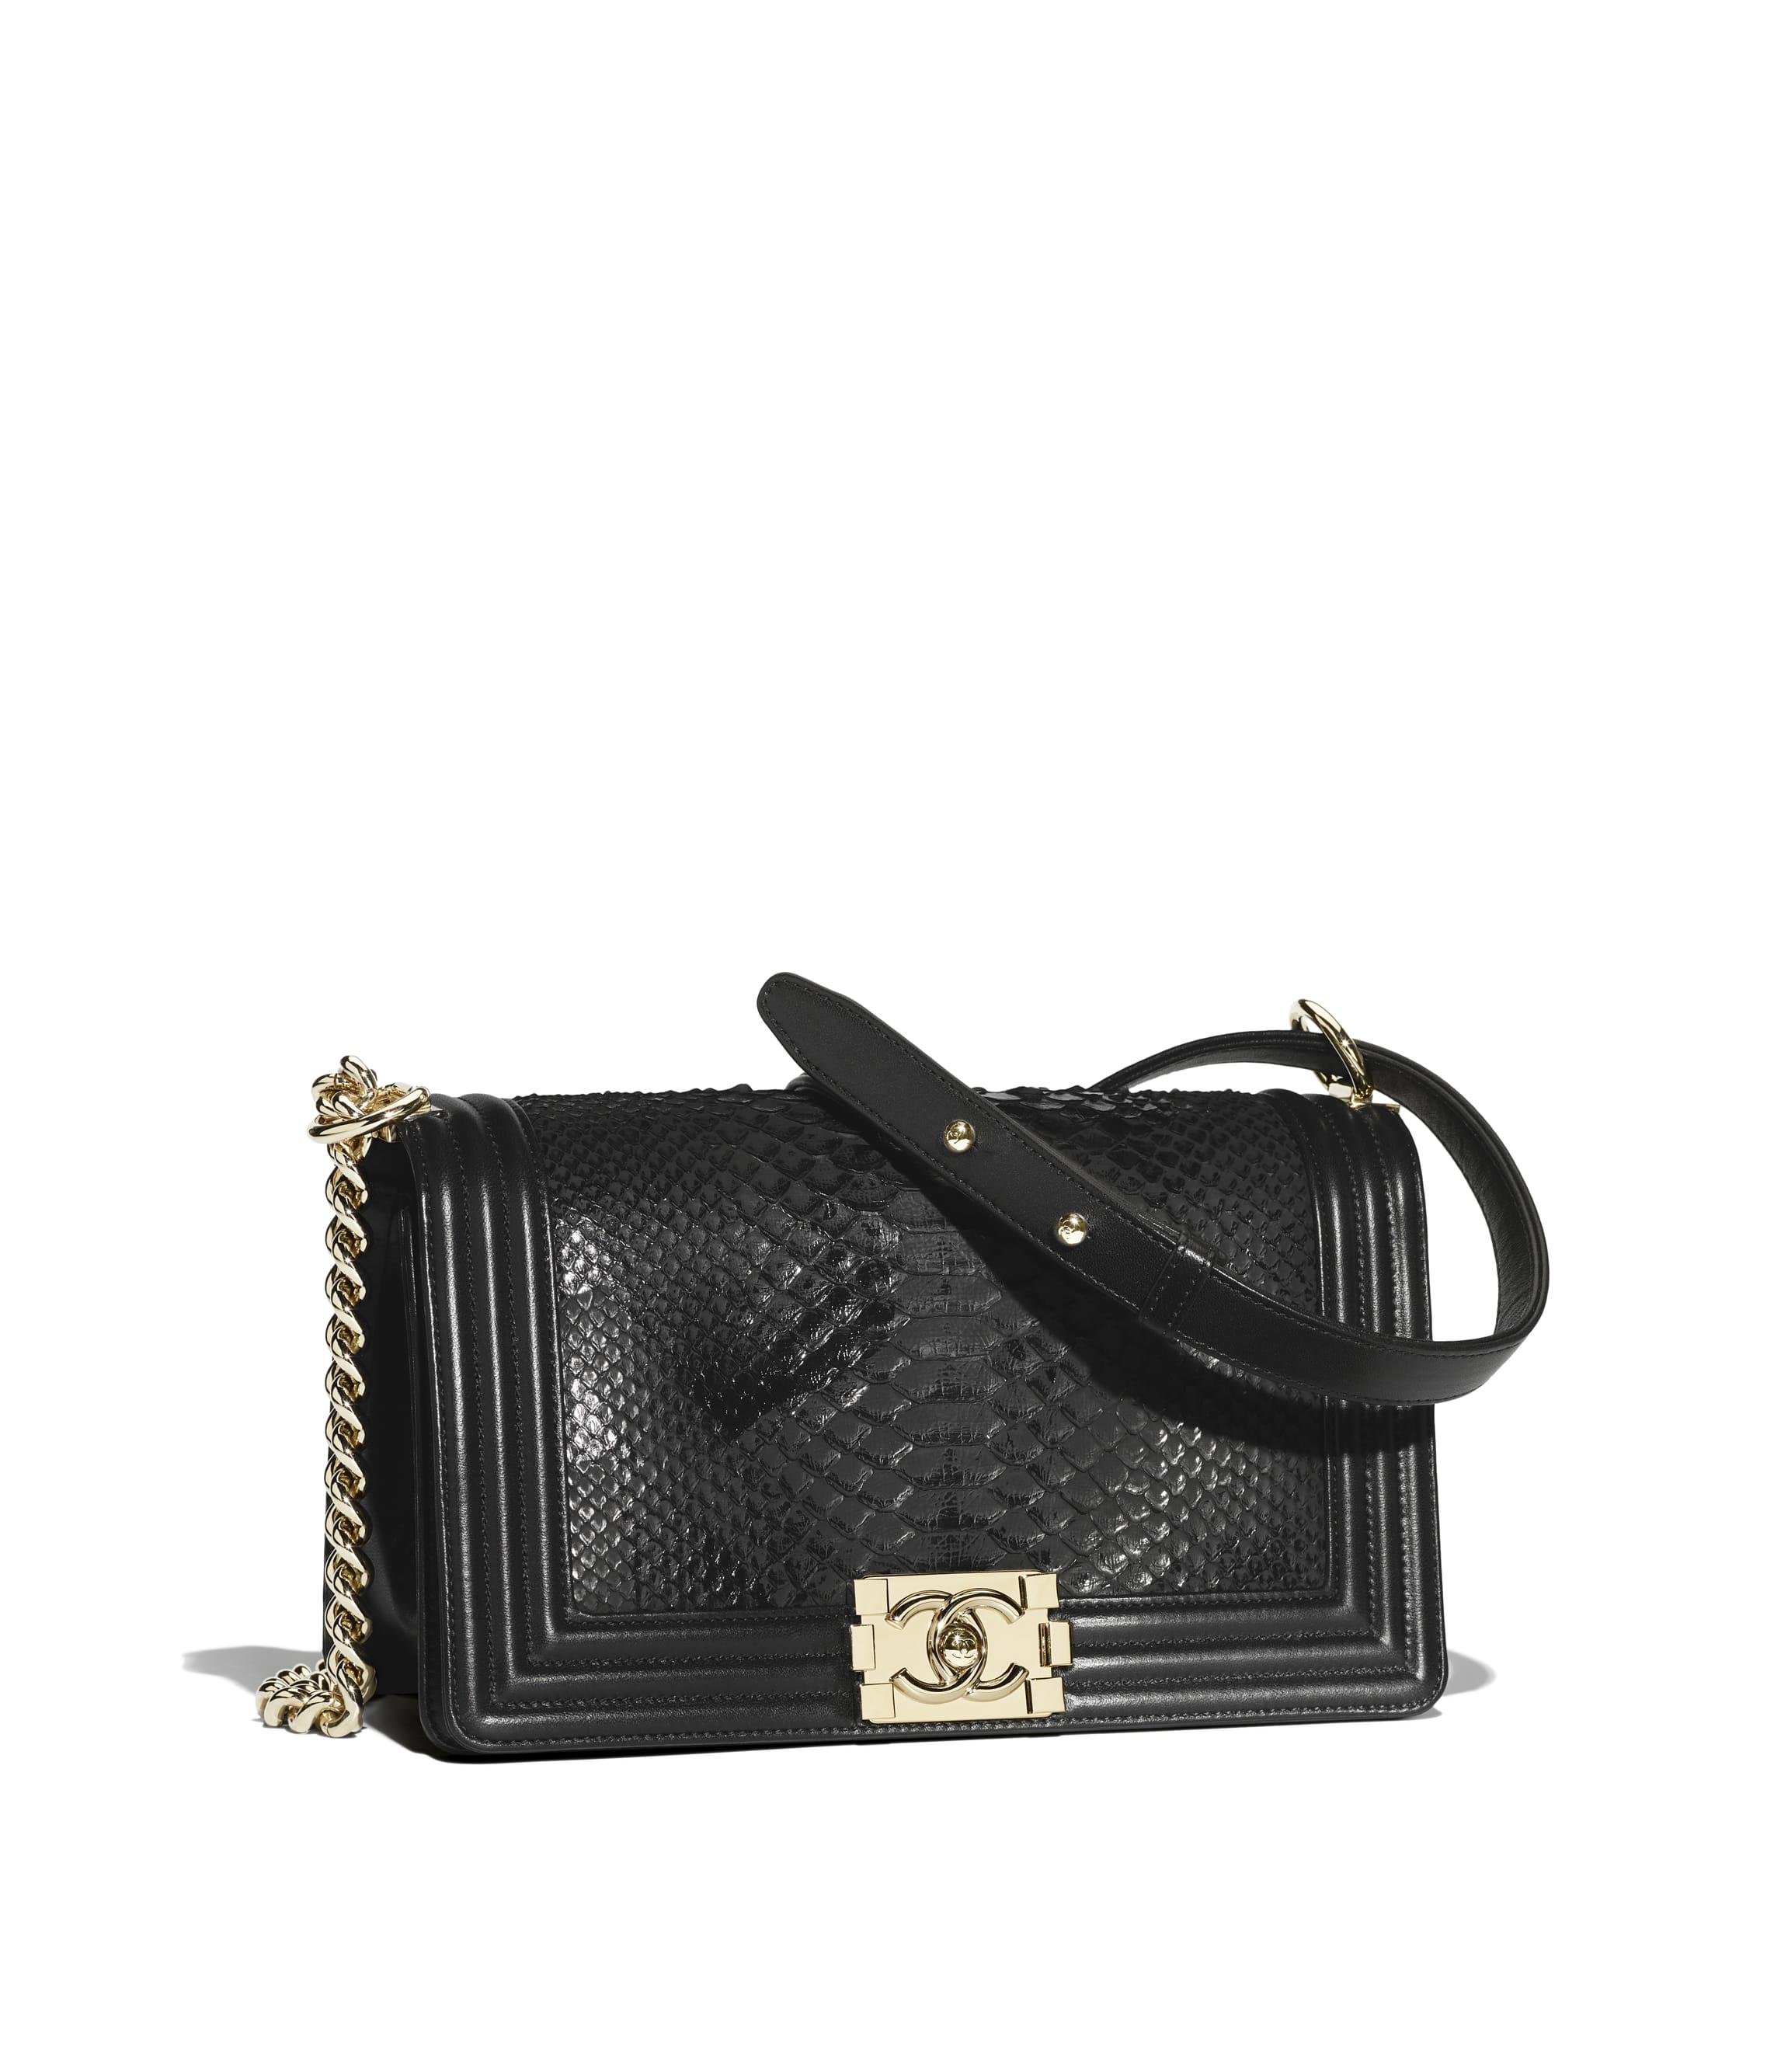 Boy Chanel Handbag Python